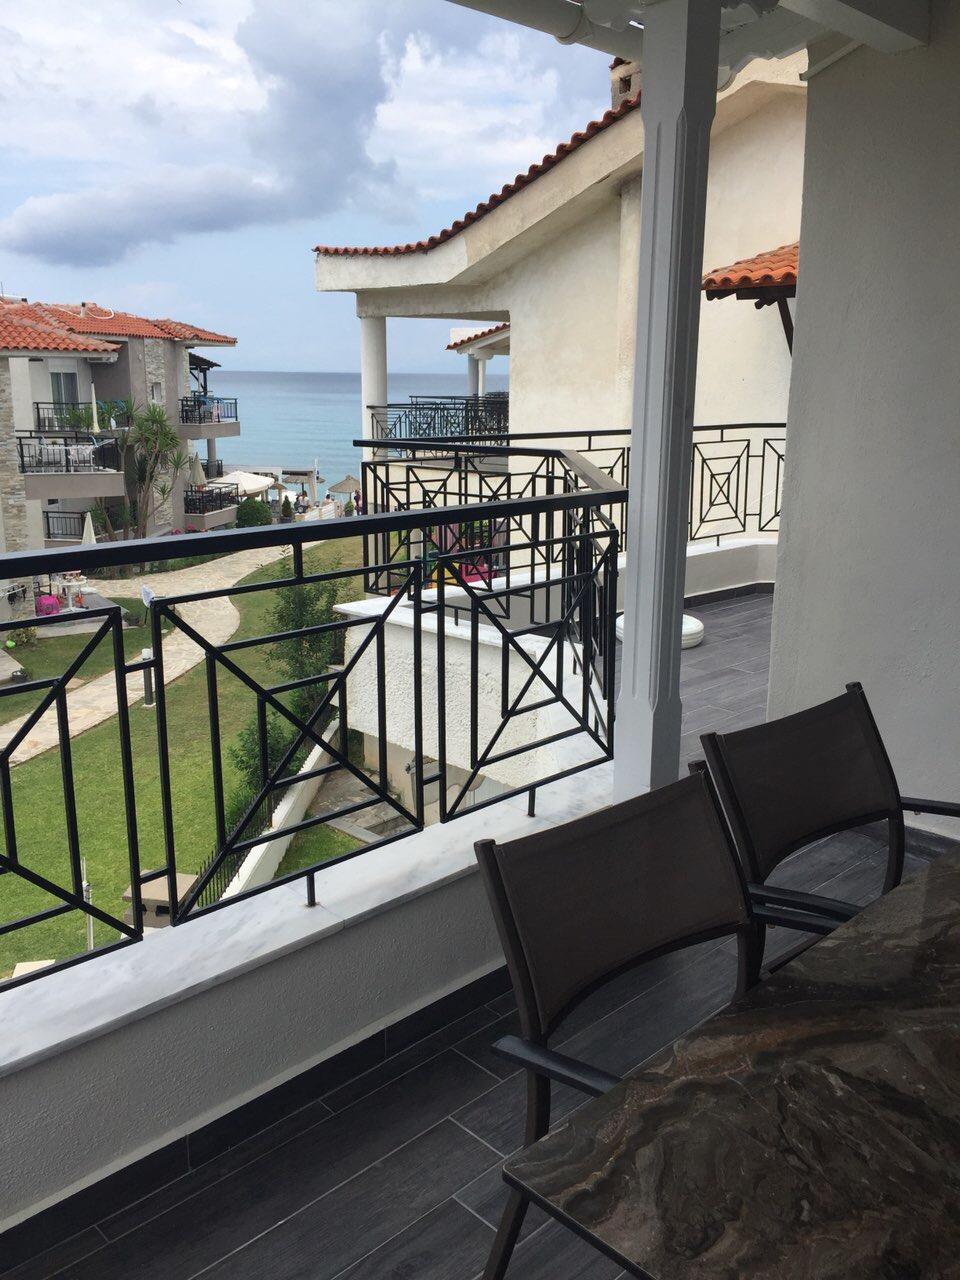 http://litsa-appartments.gr/wp-content/uploads/2018/11/IMG_4783.jpg